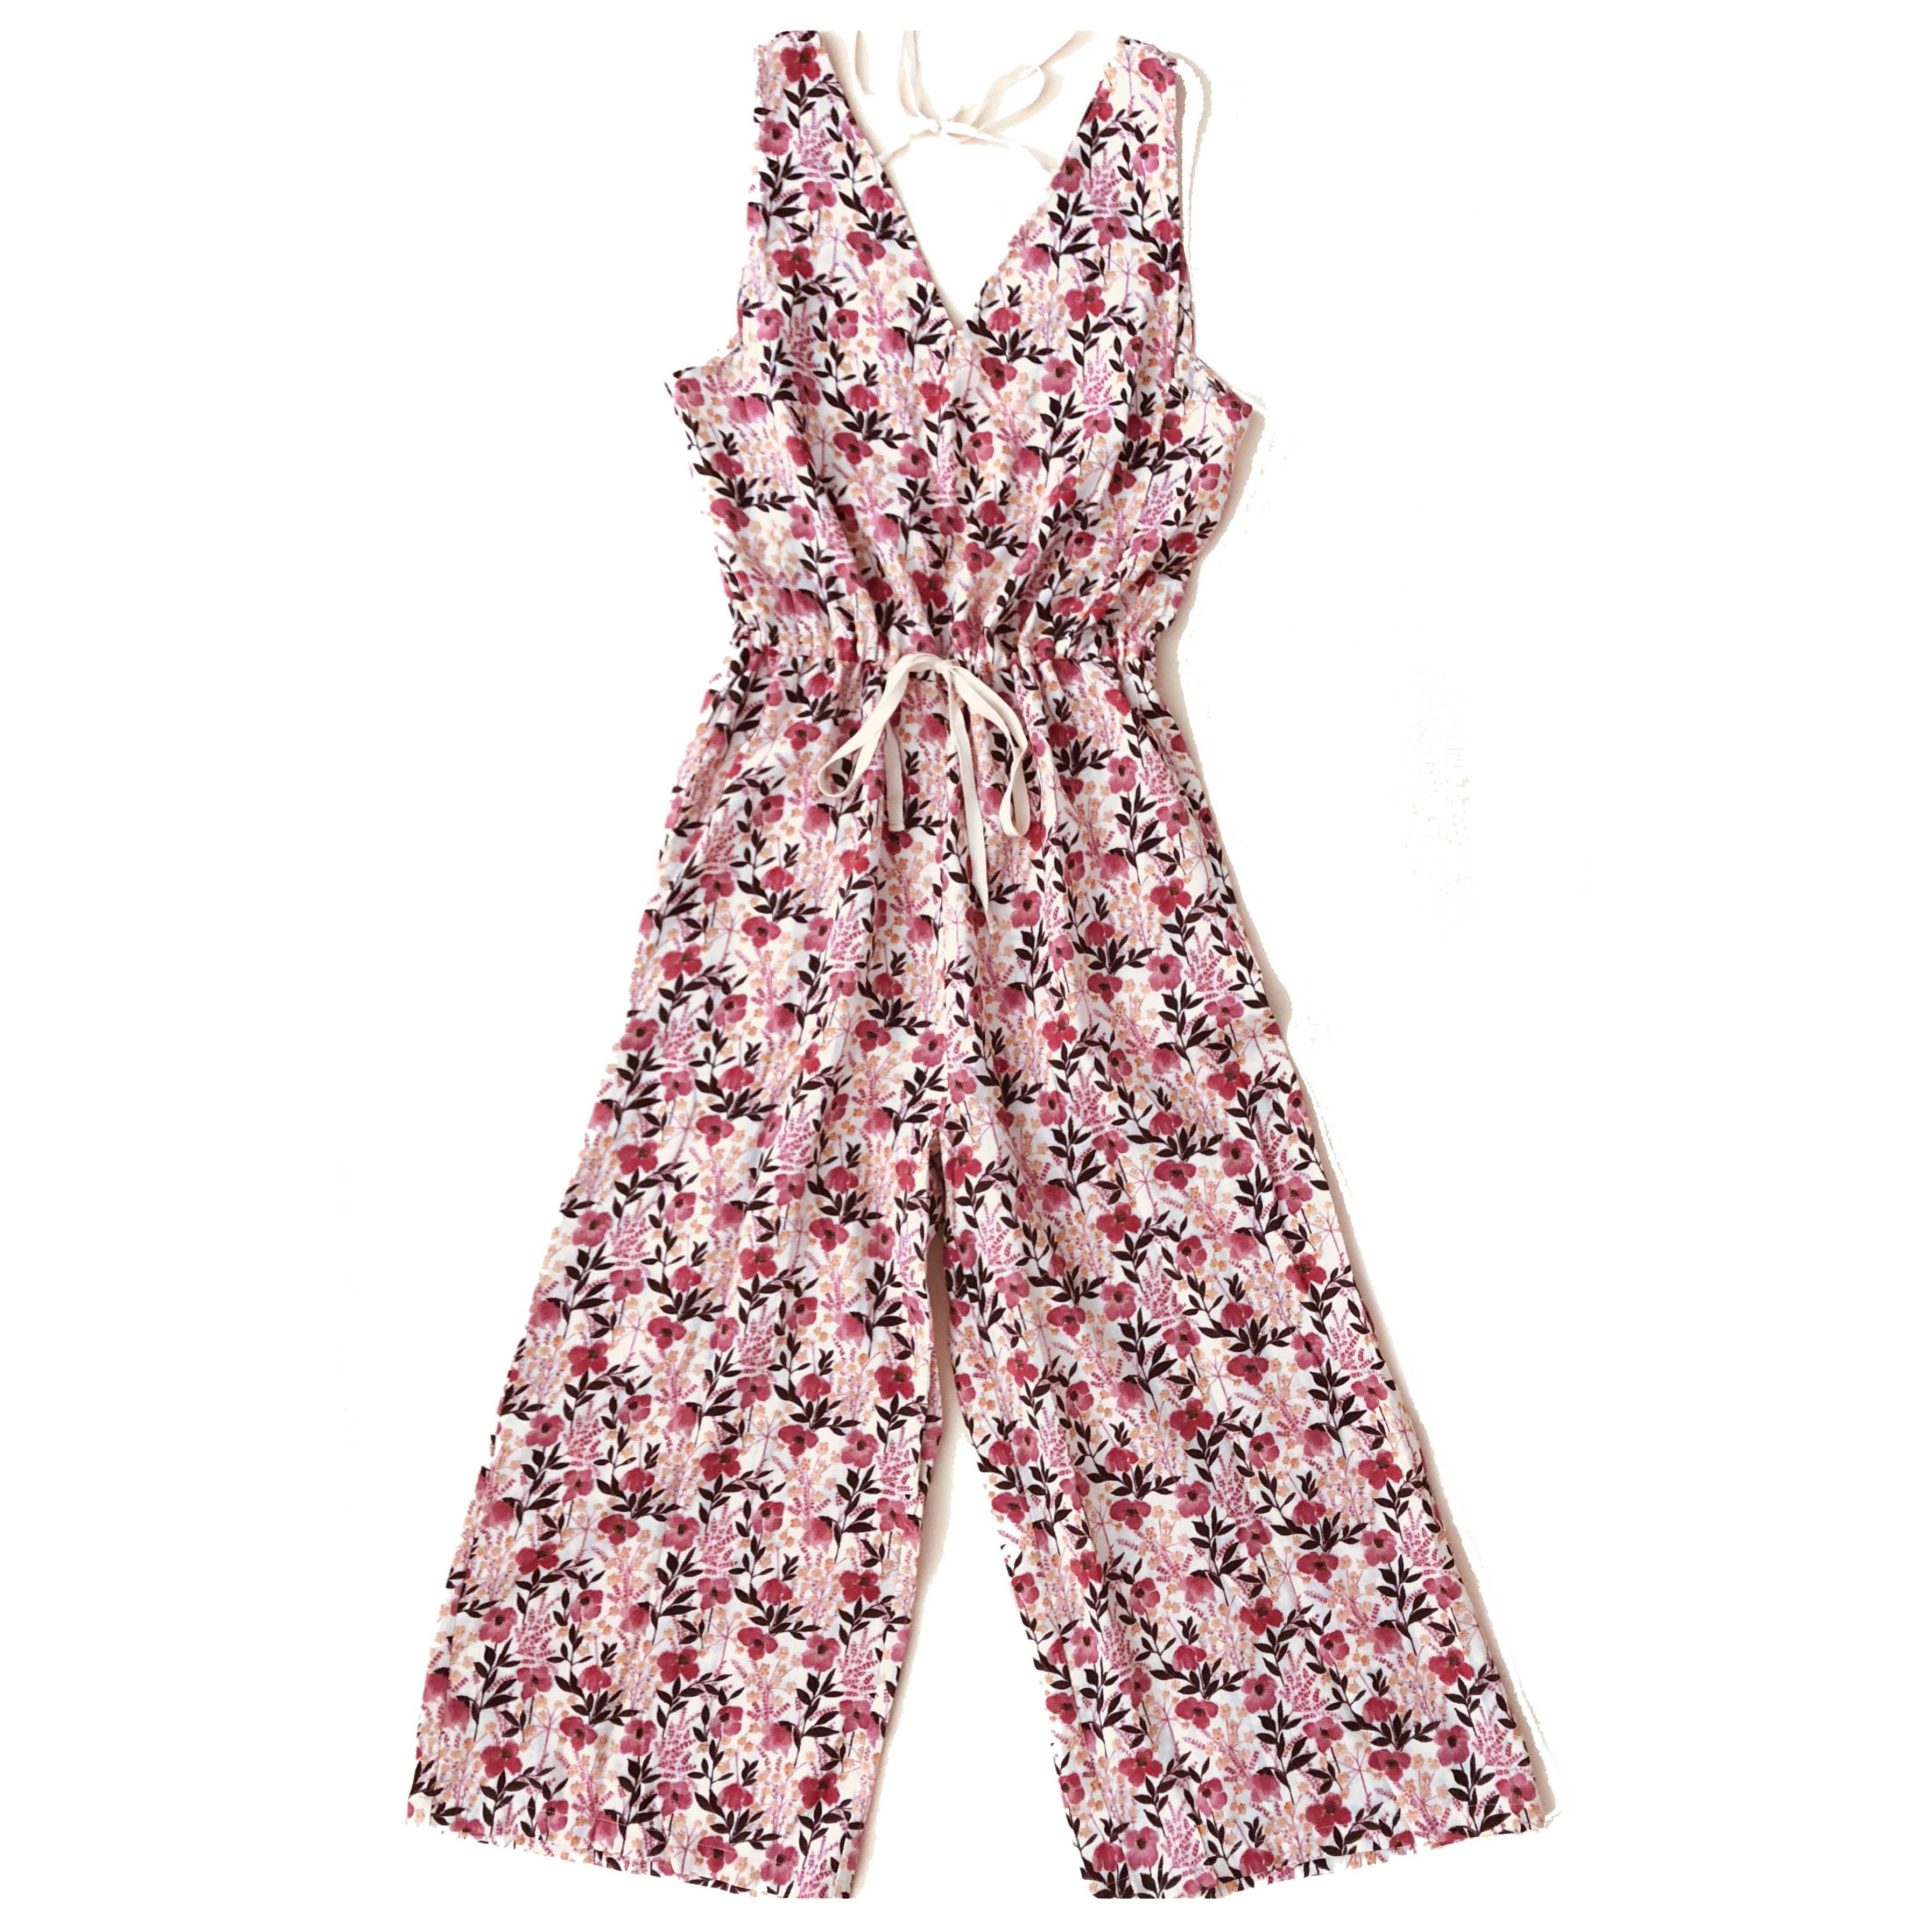 PLAY etc. Floral Jumpsuit Pink